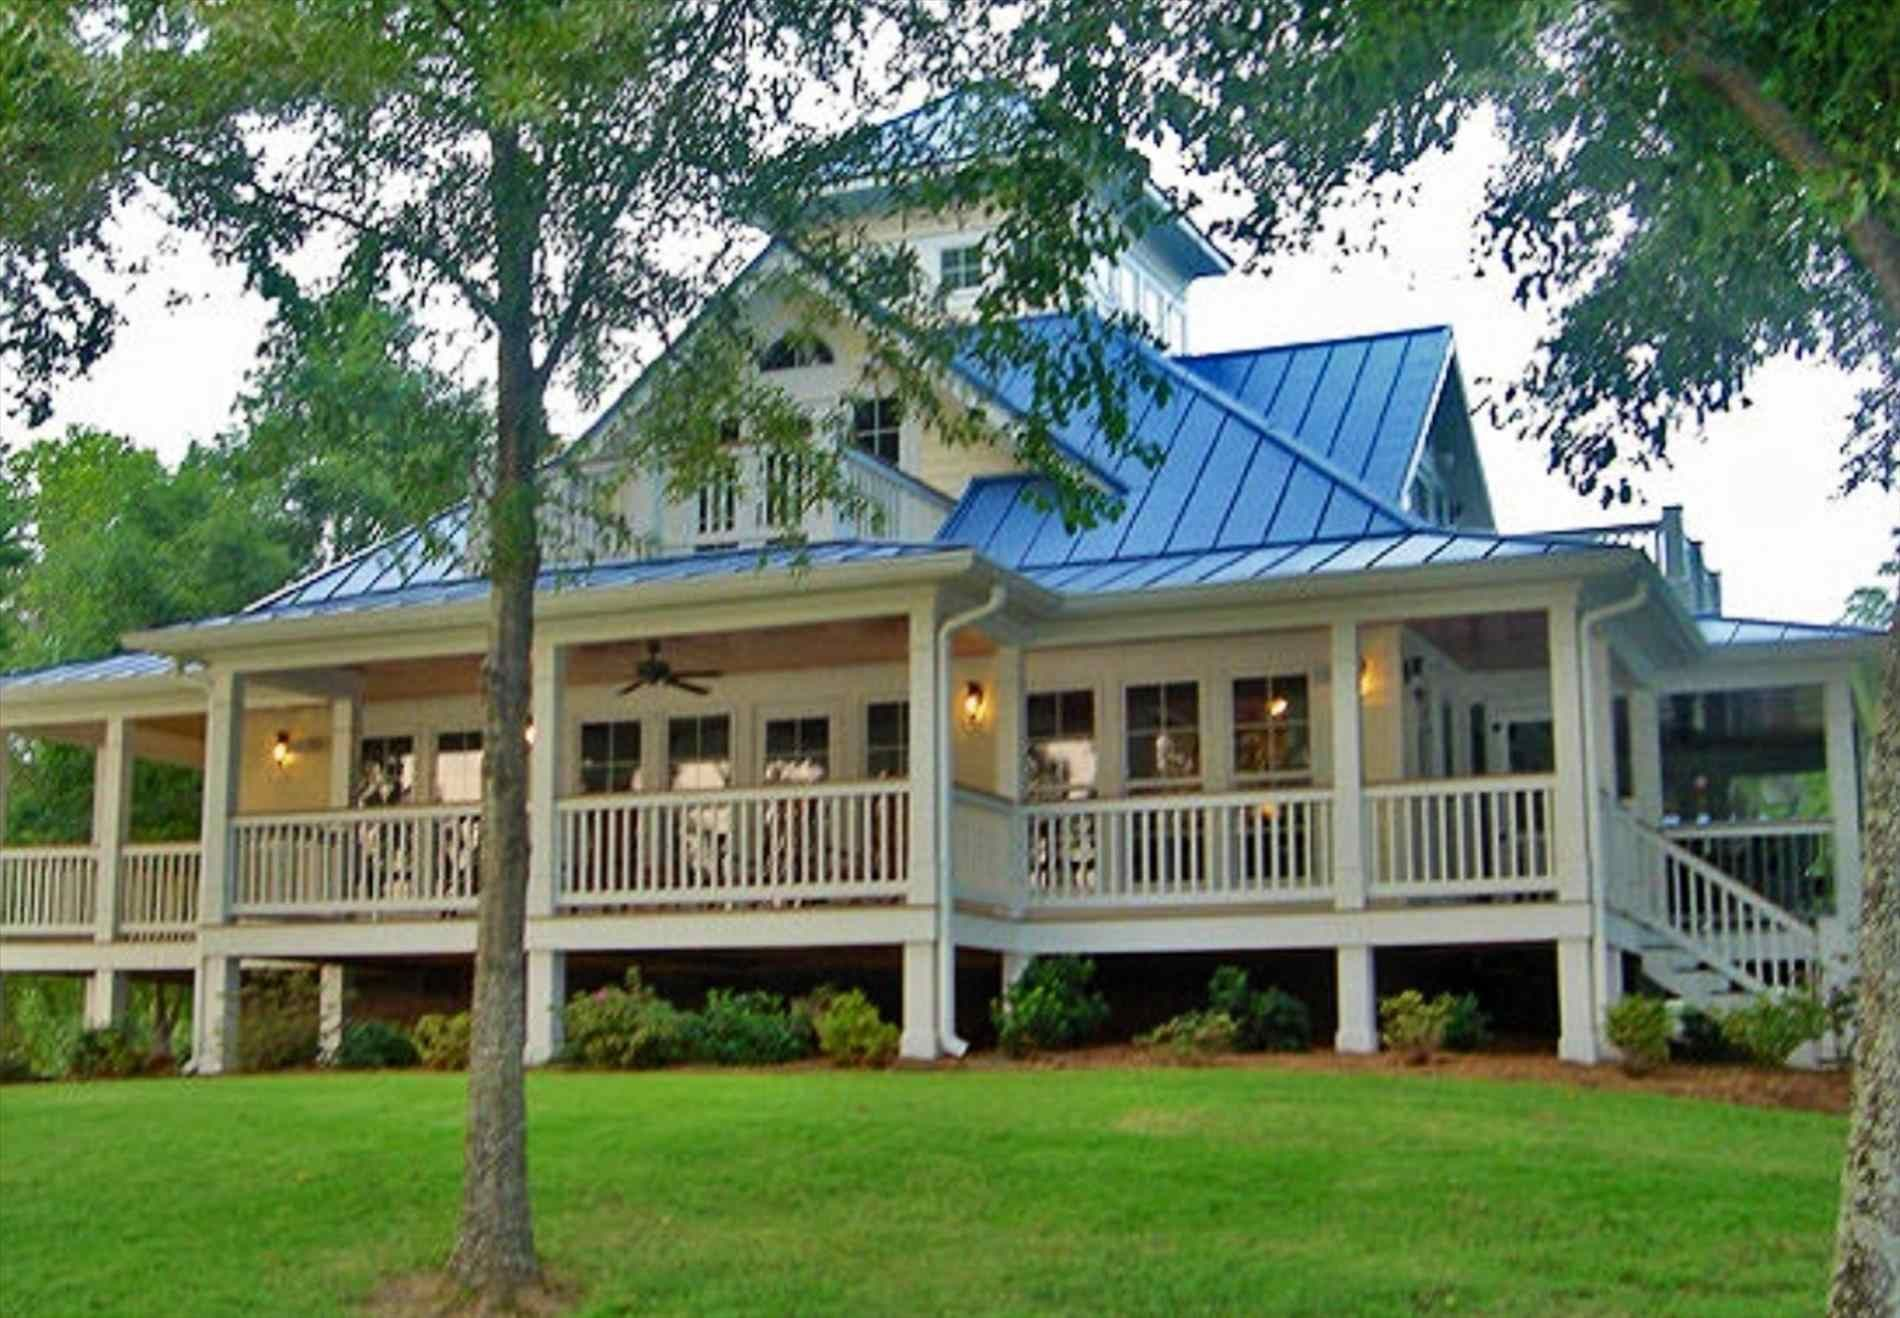 10 Inspiring English Cottage House Plans Cottage House Plans Cottage Plan Beach House Plans